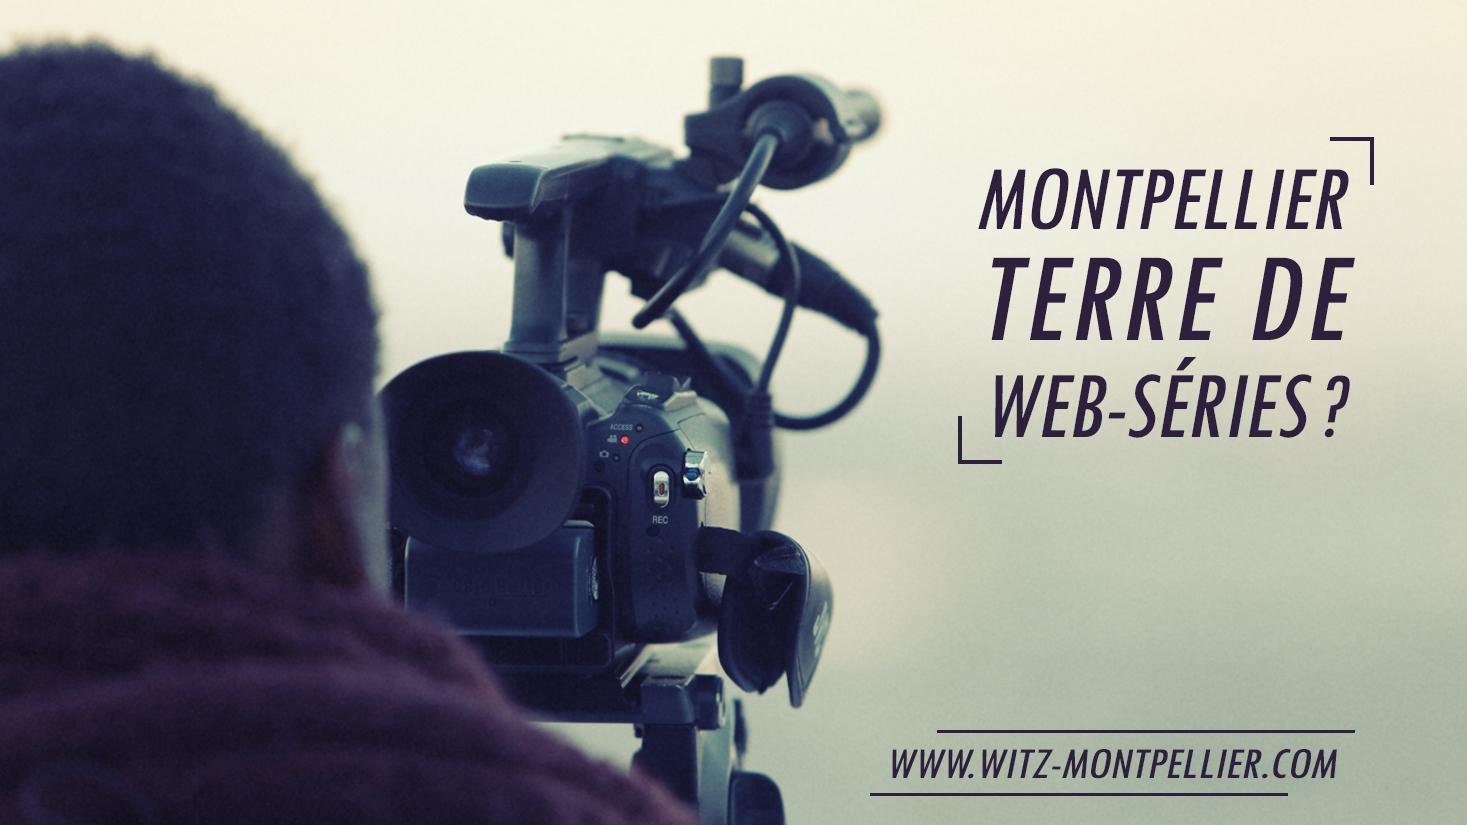 Montpellier terre de web s ries for Montpellier terre archi